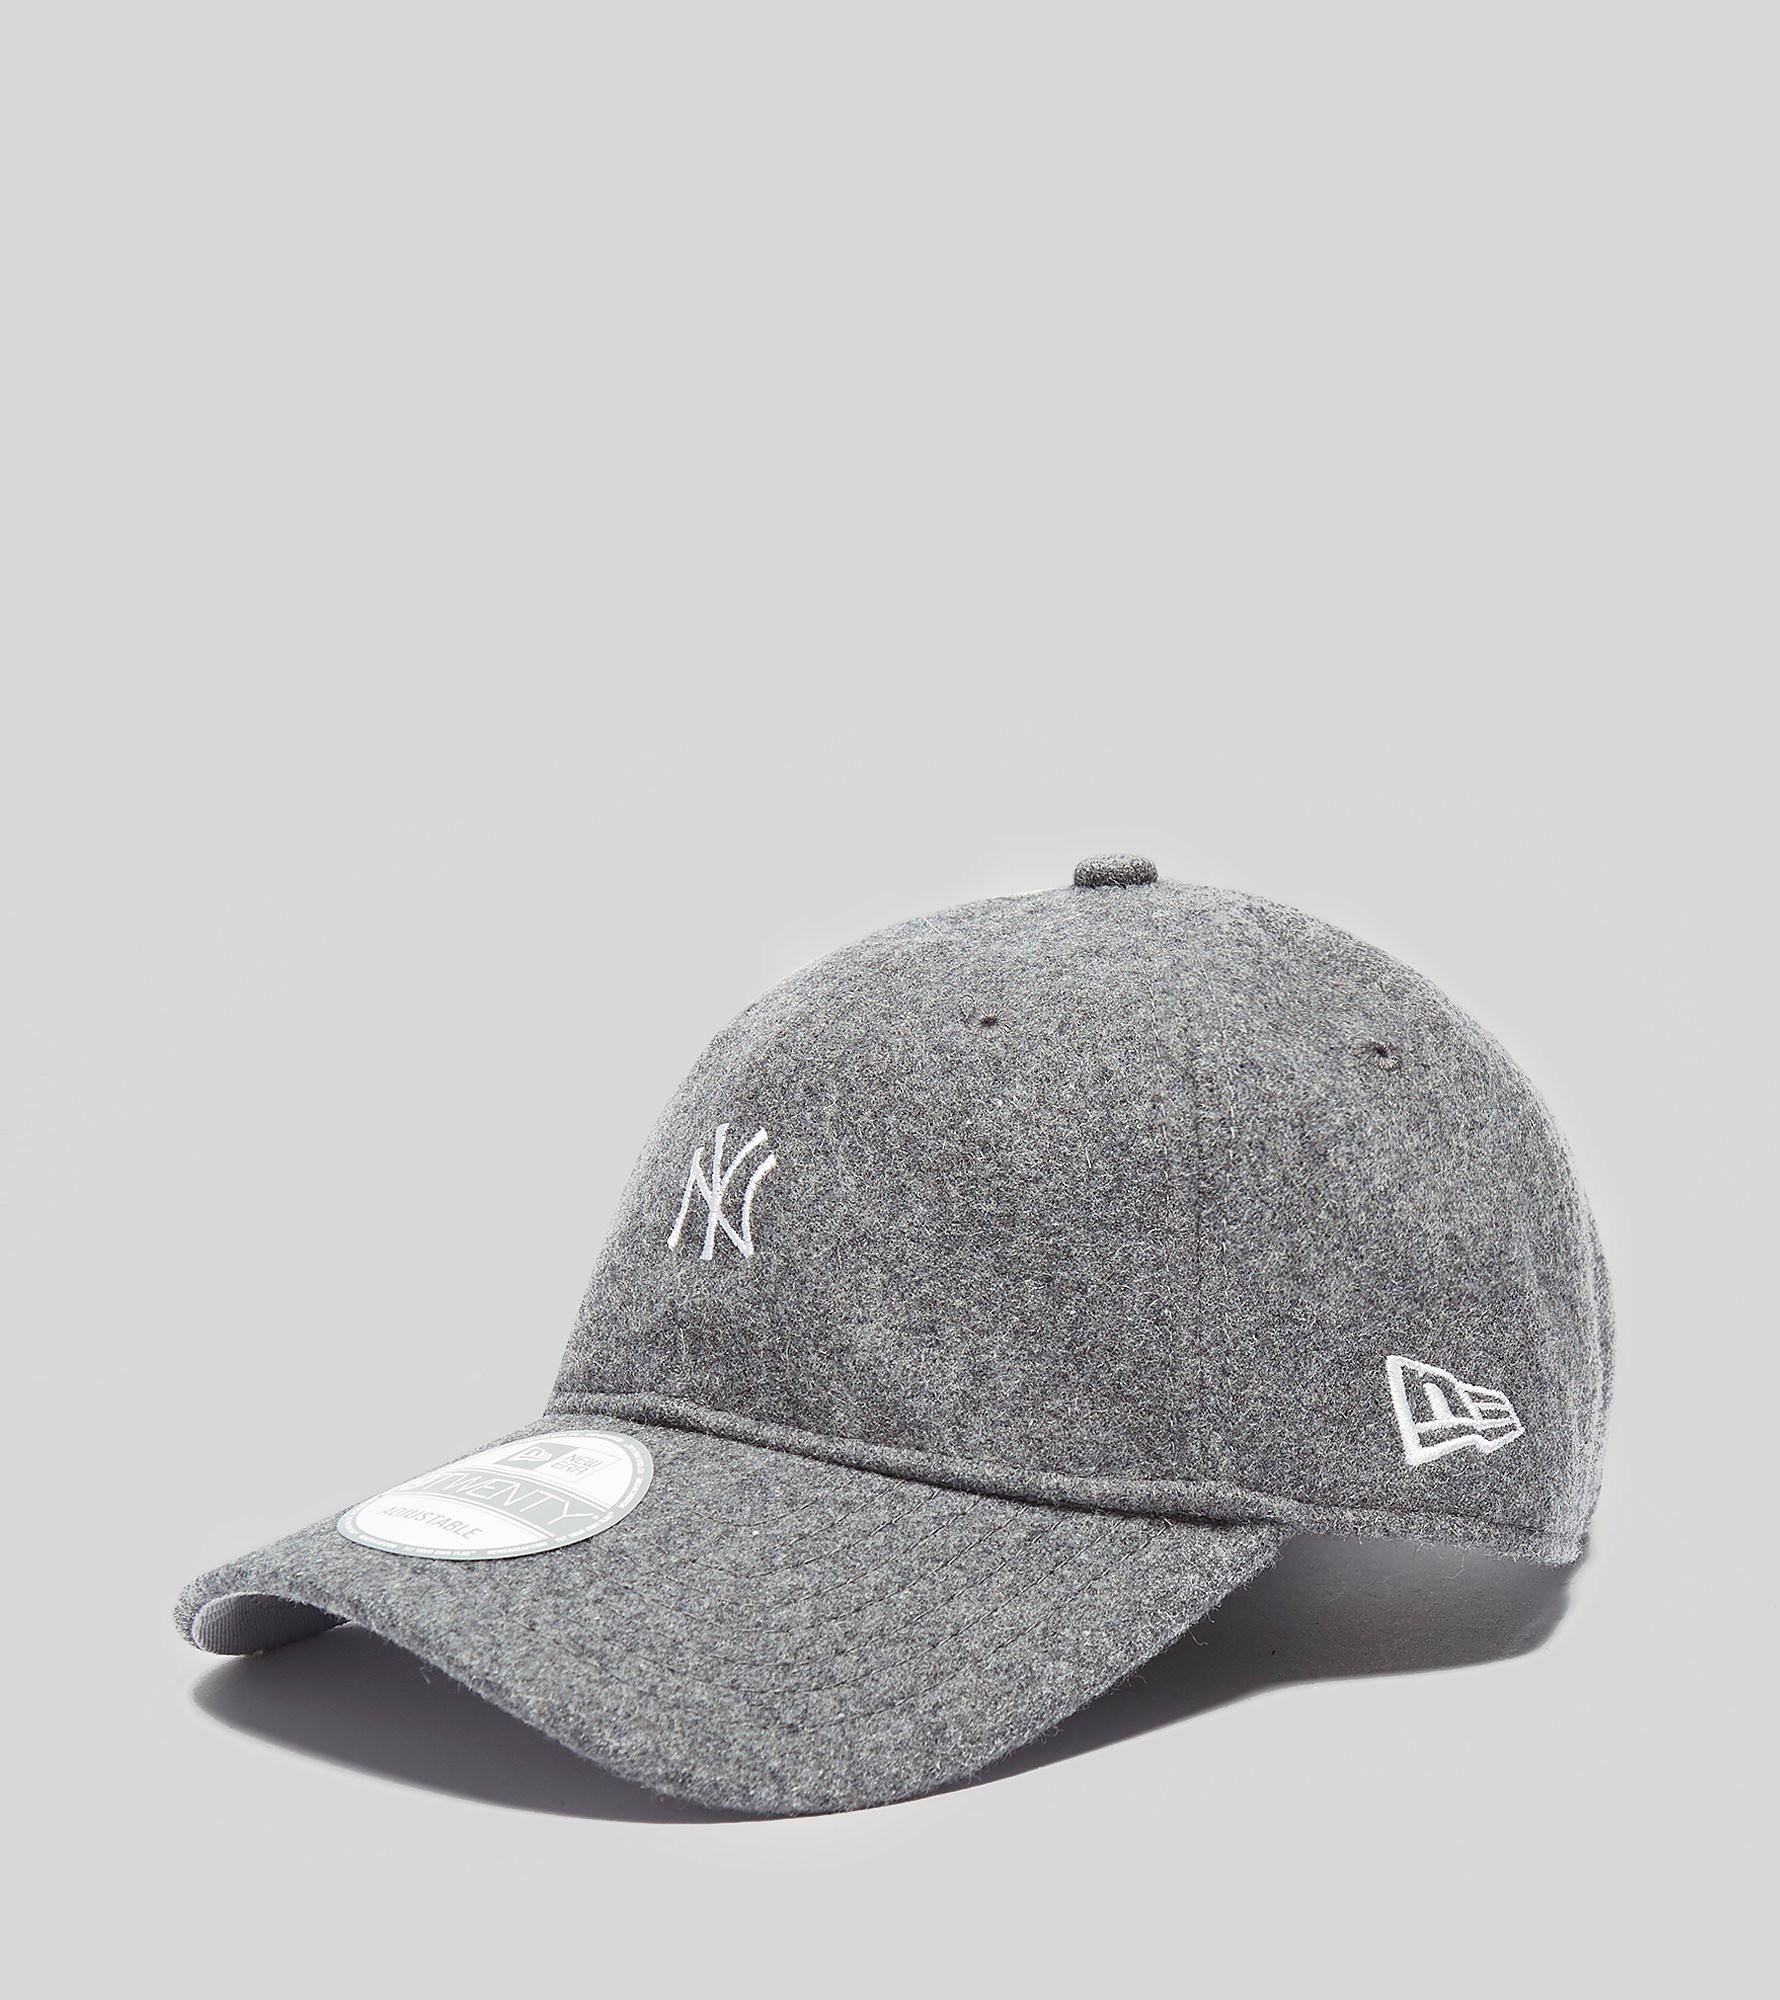 New Era 9TWENTY MLB Wool Cap